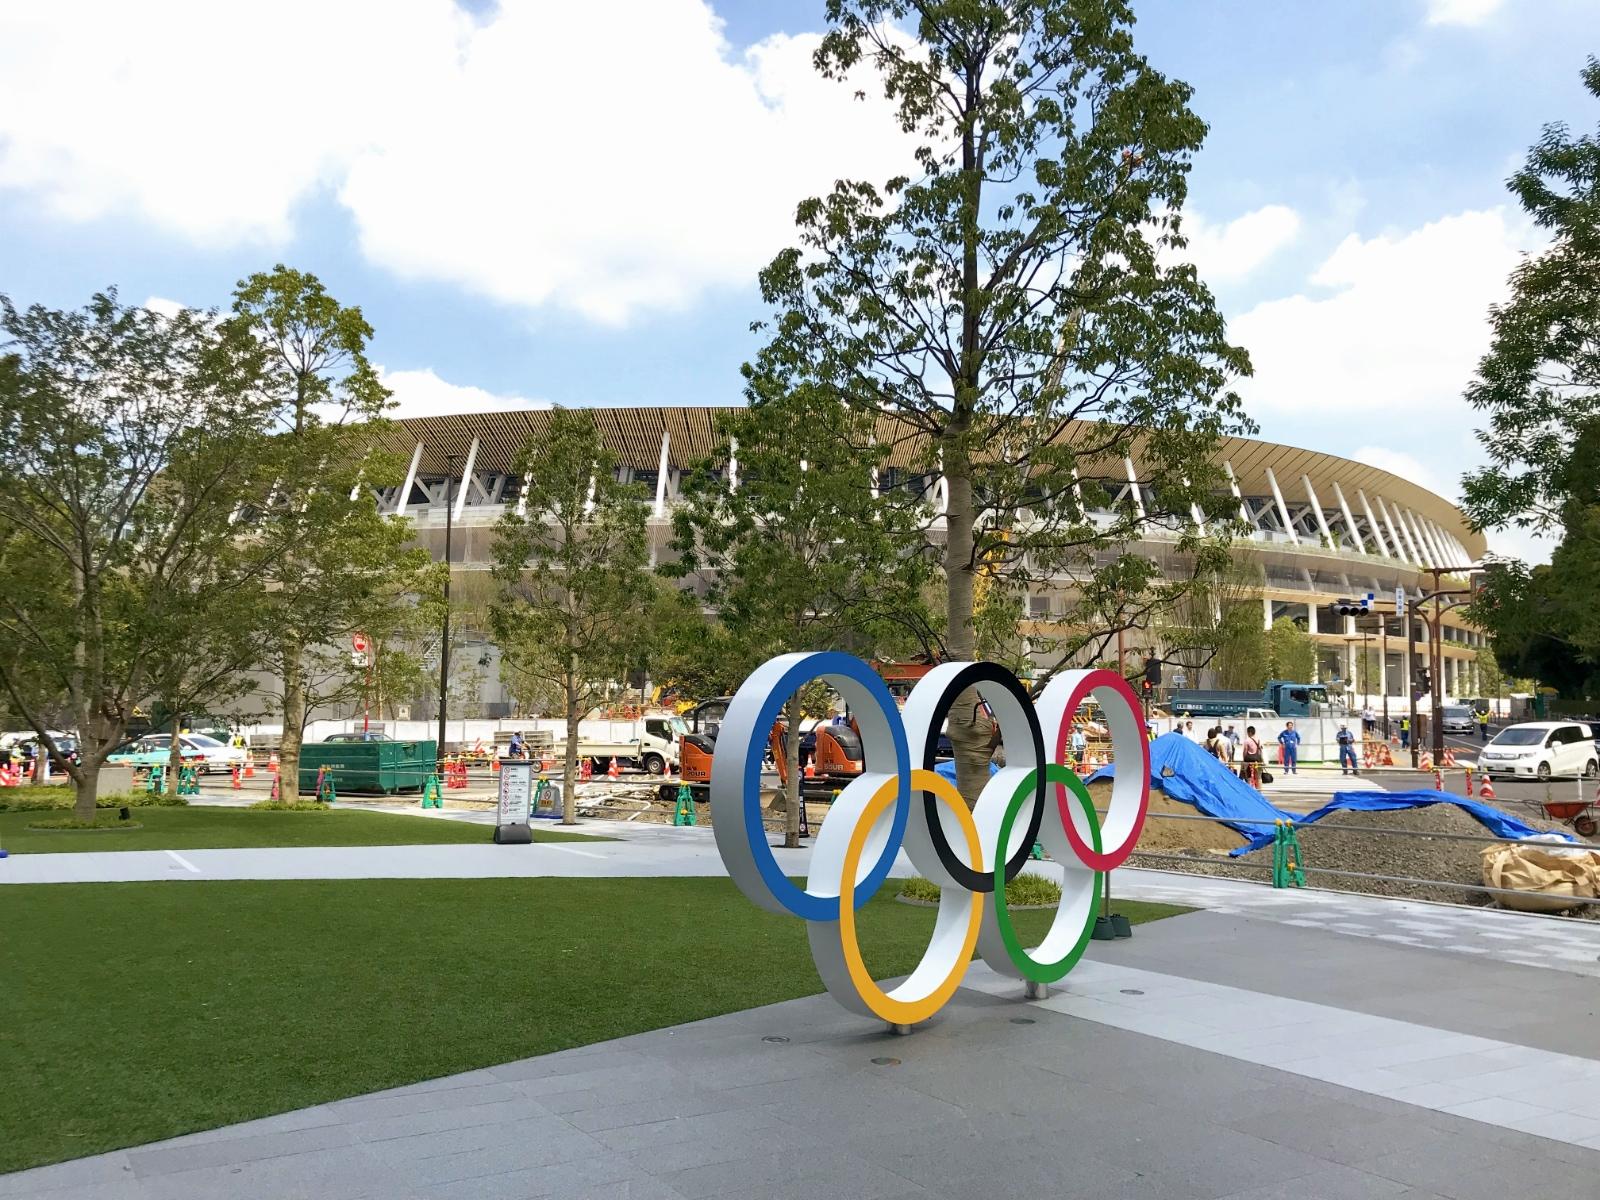 National-Olympic-Stadium-2019-08-08.jpg